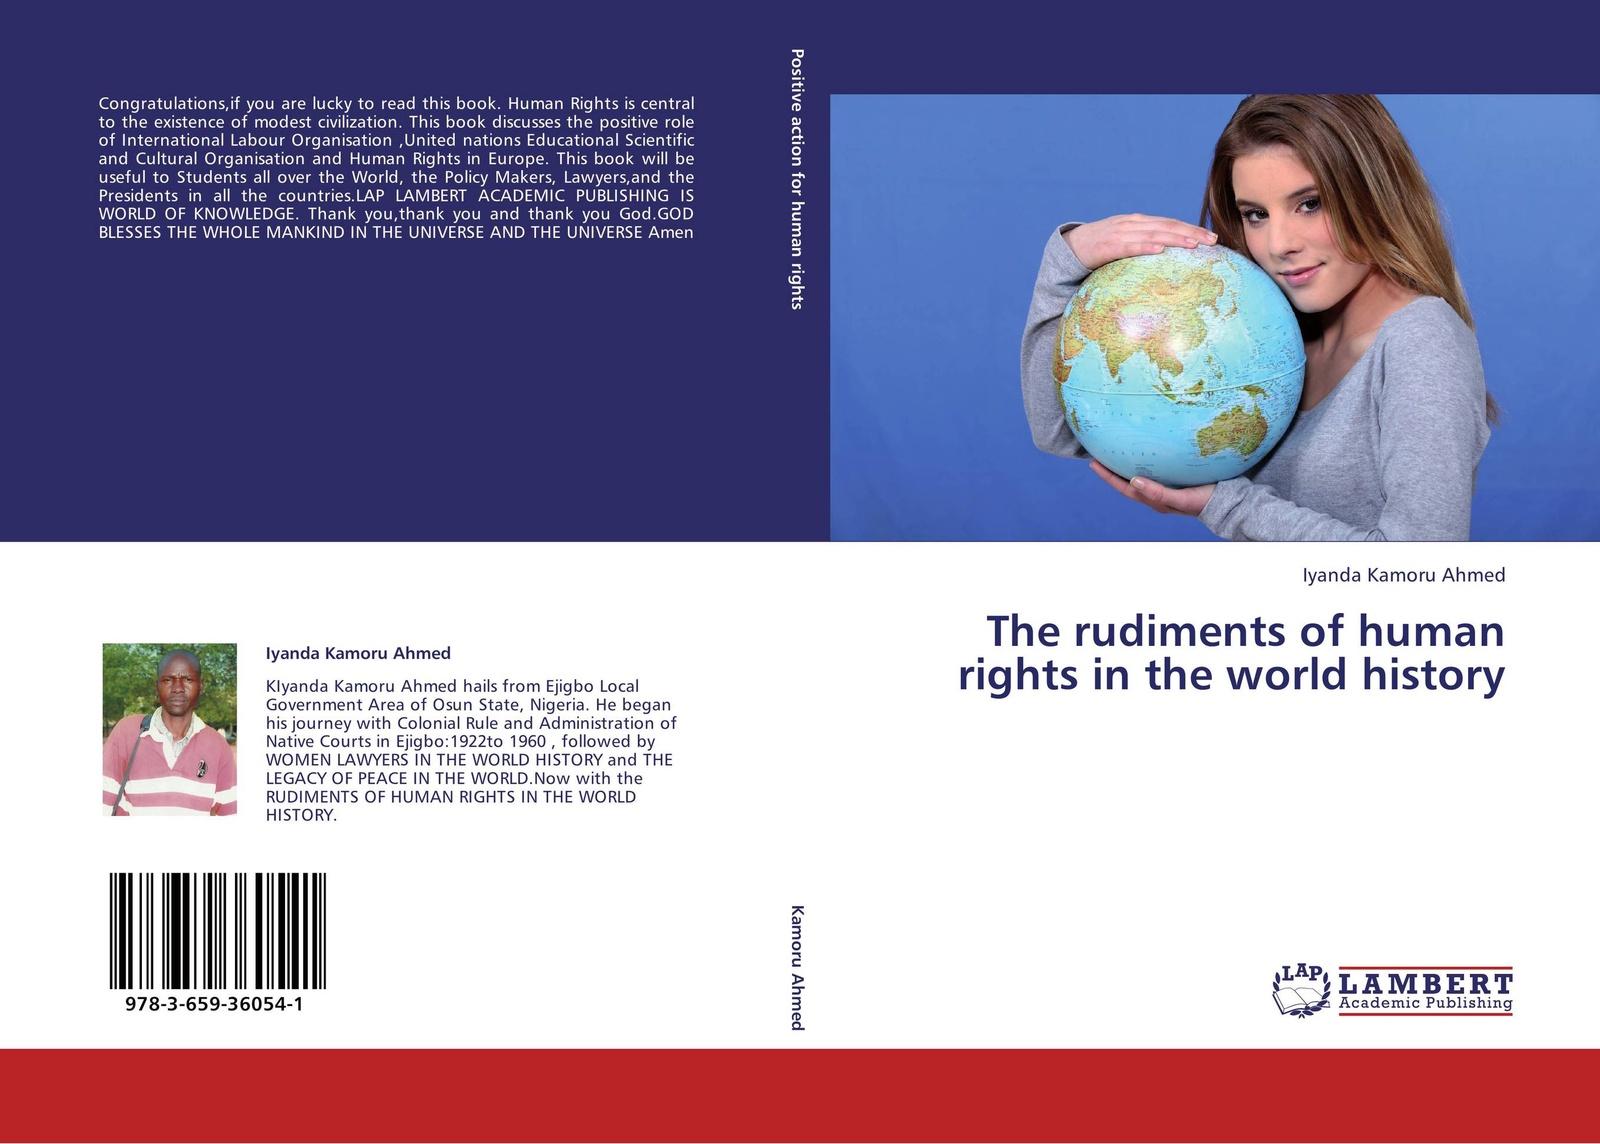 Iyanda Kamoru Ahmed The rudiments of human rights in the world history fiona macmillan the world trade organization and human rights